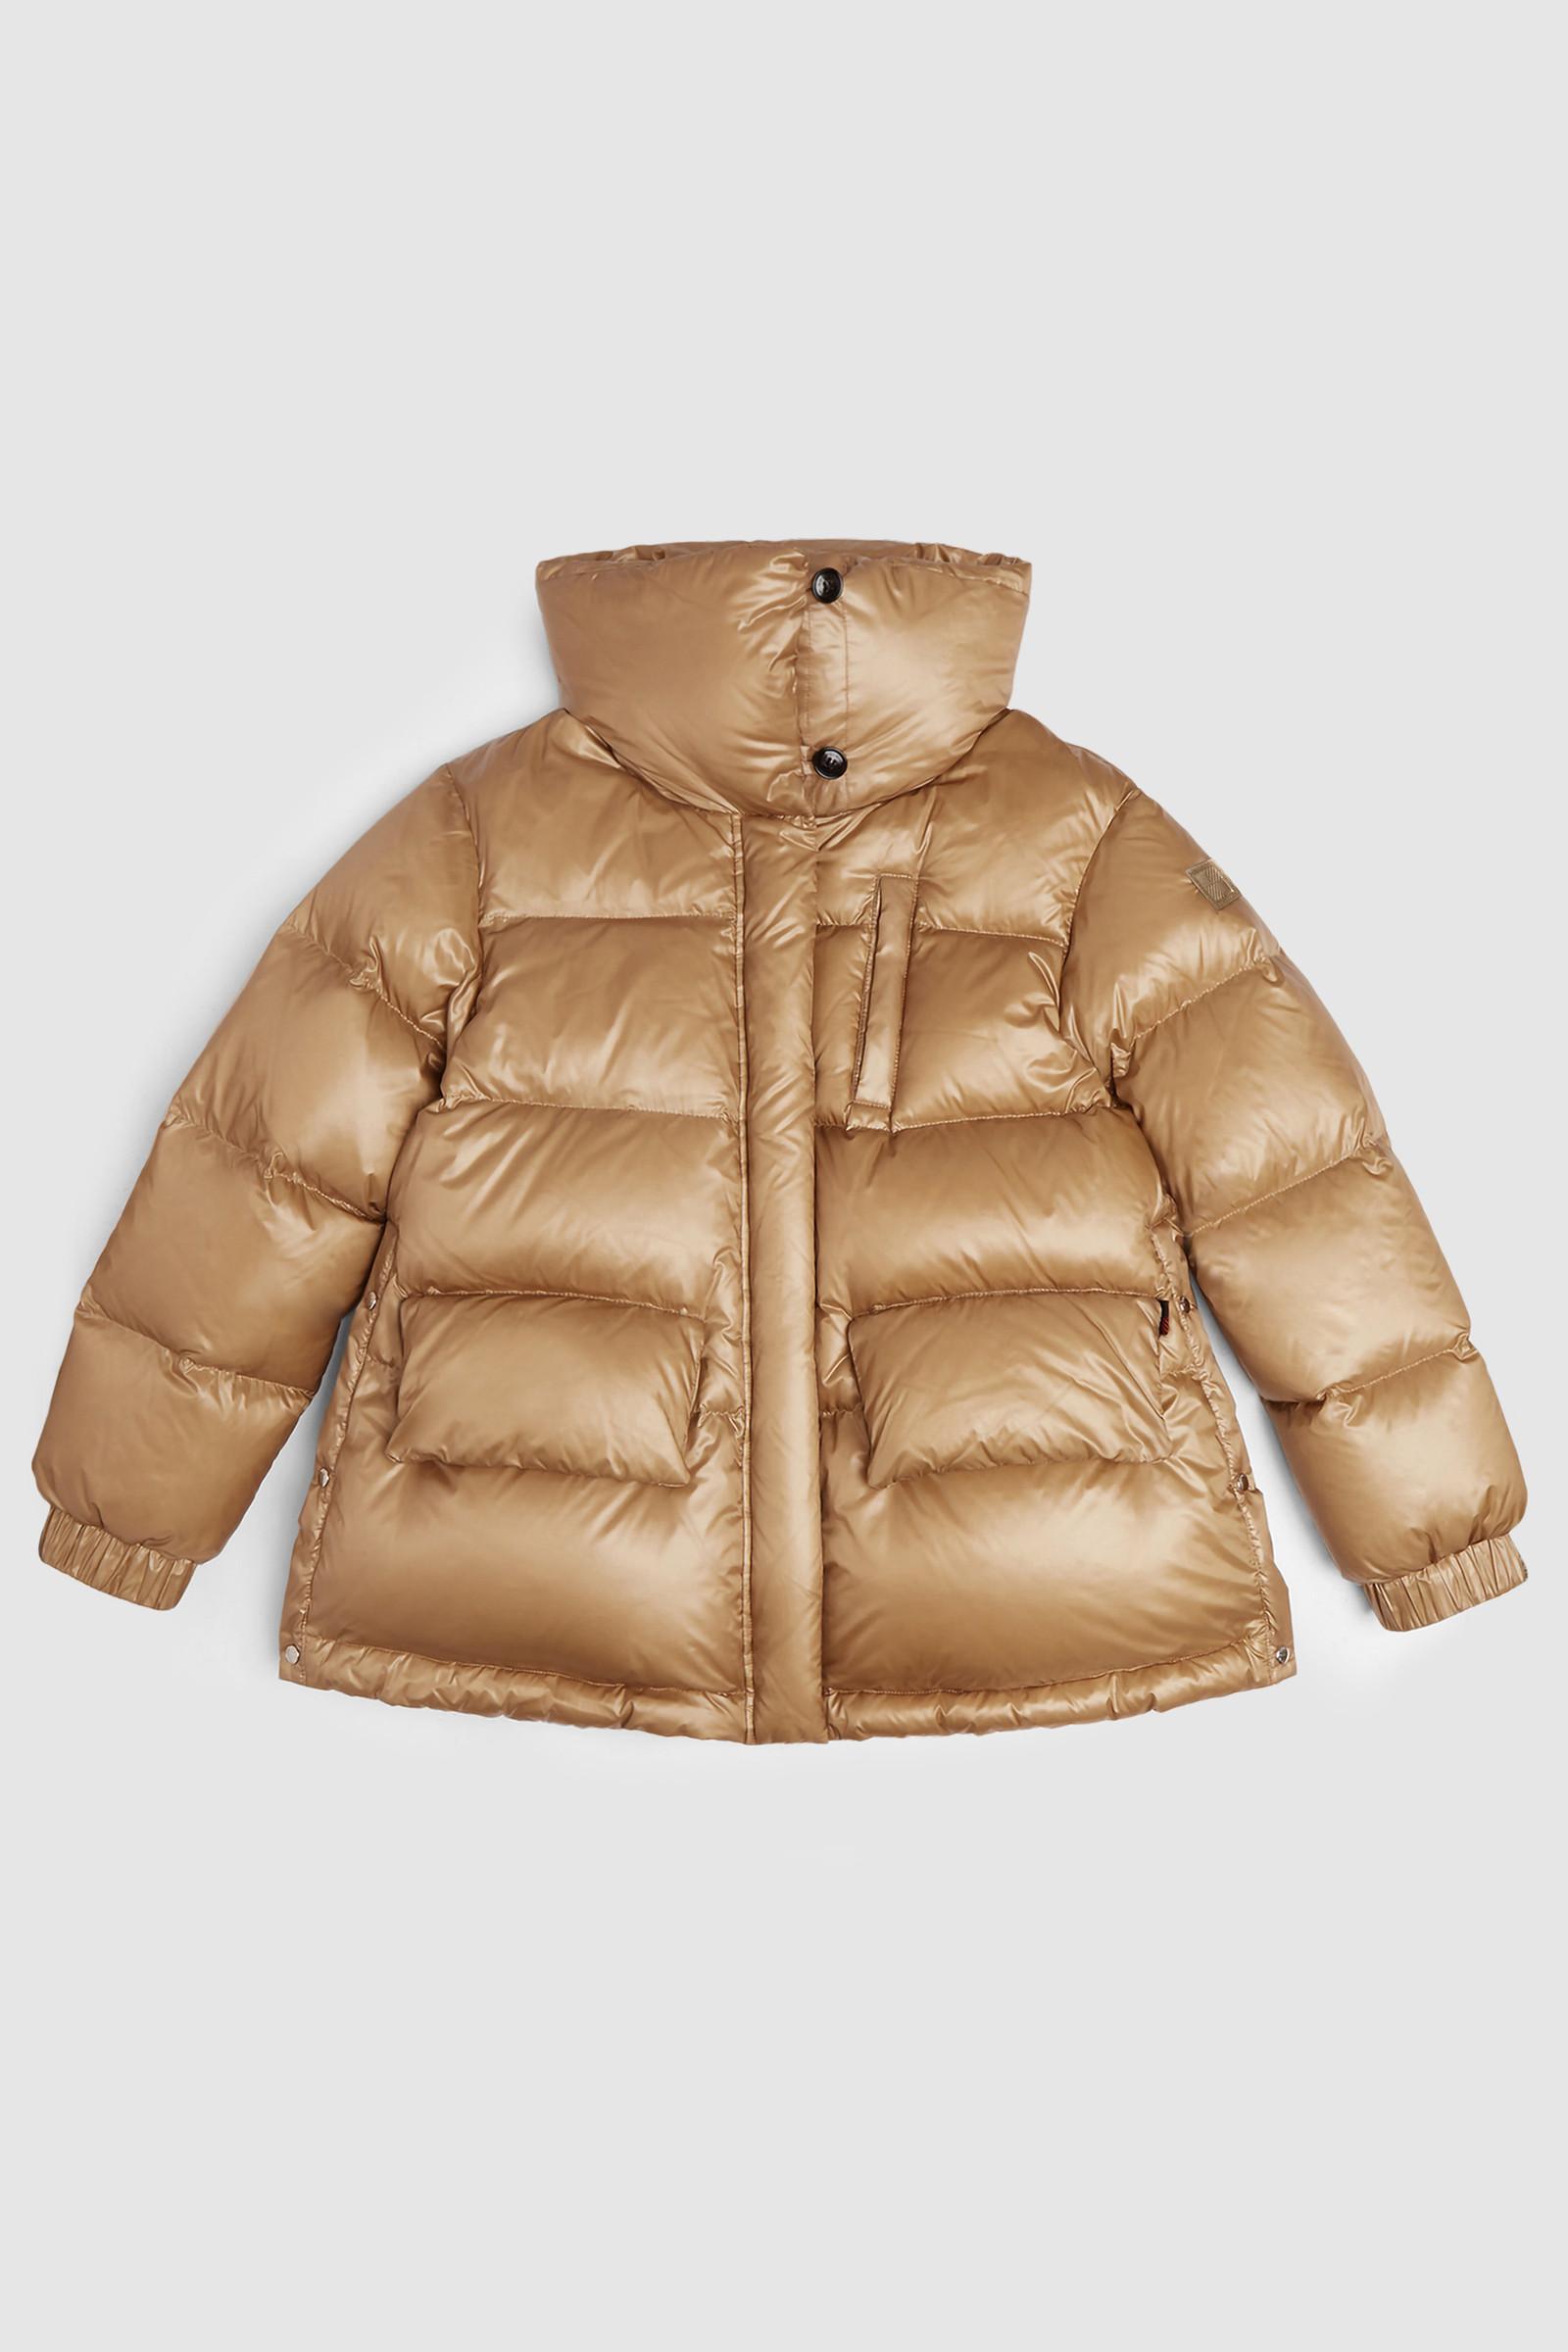 Aliquippa Short Down Jacket